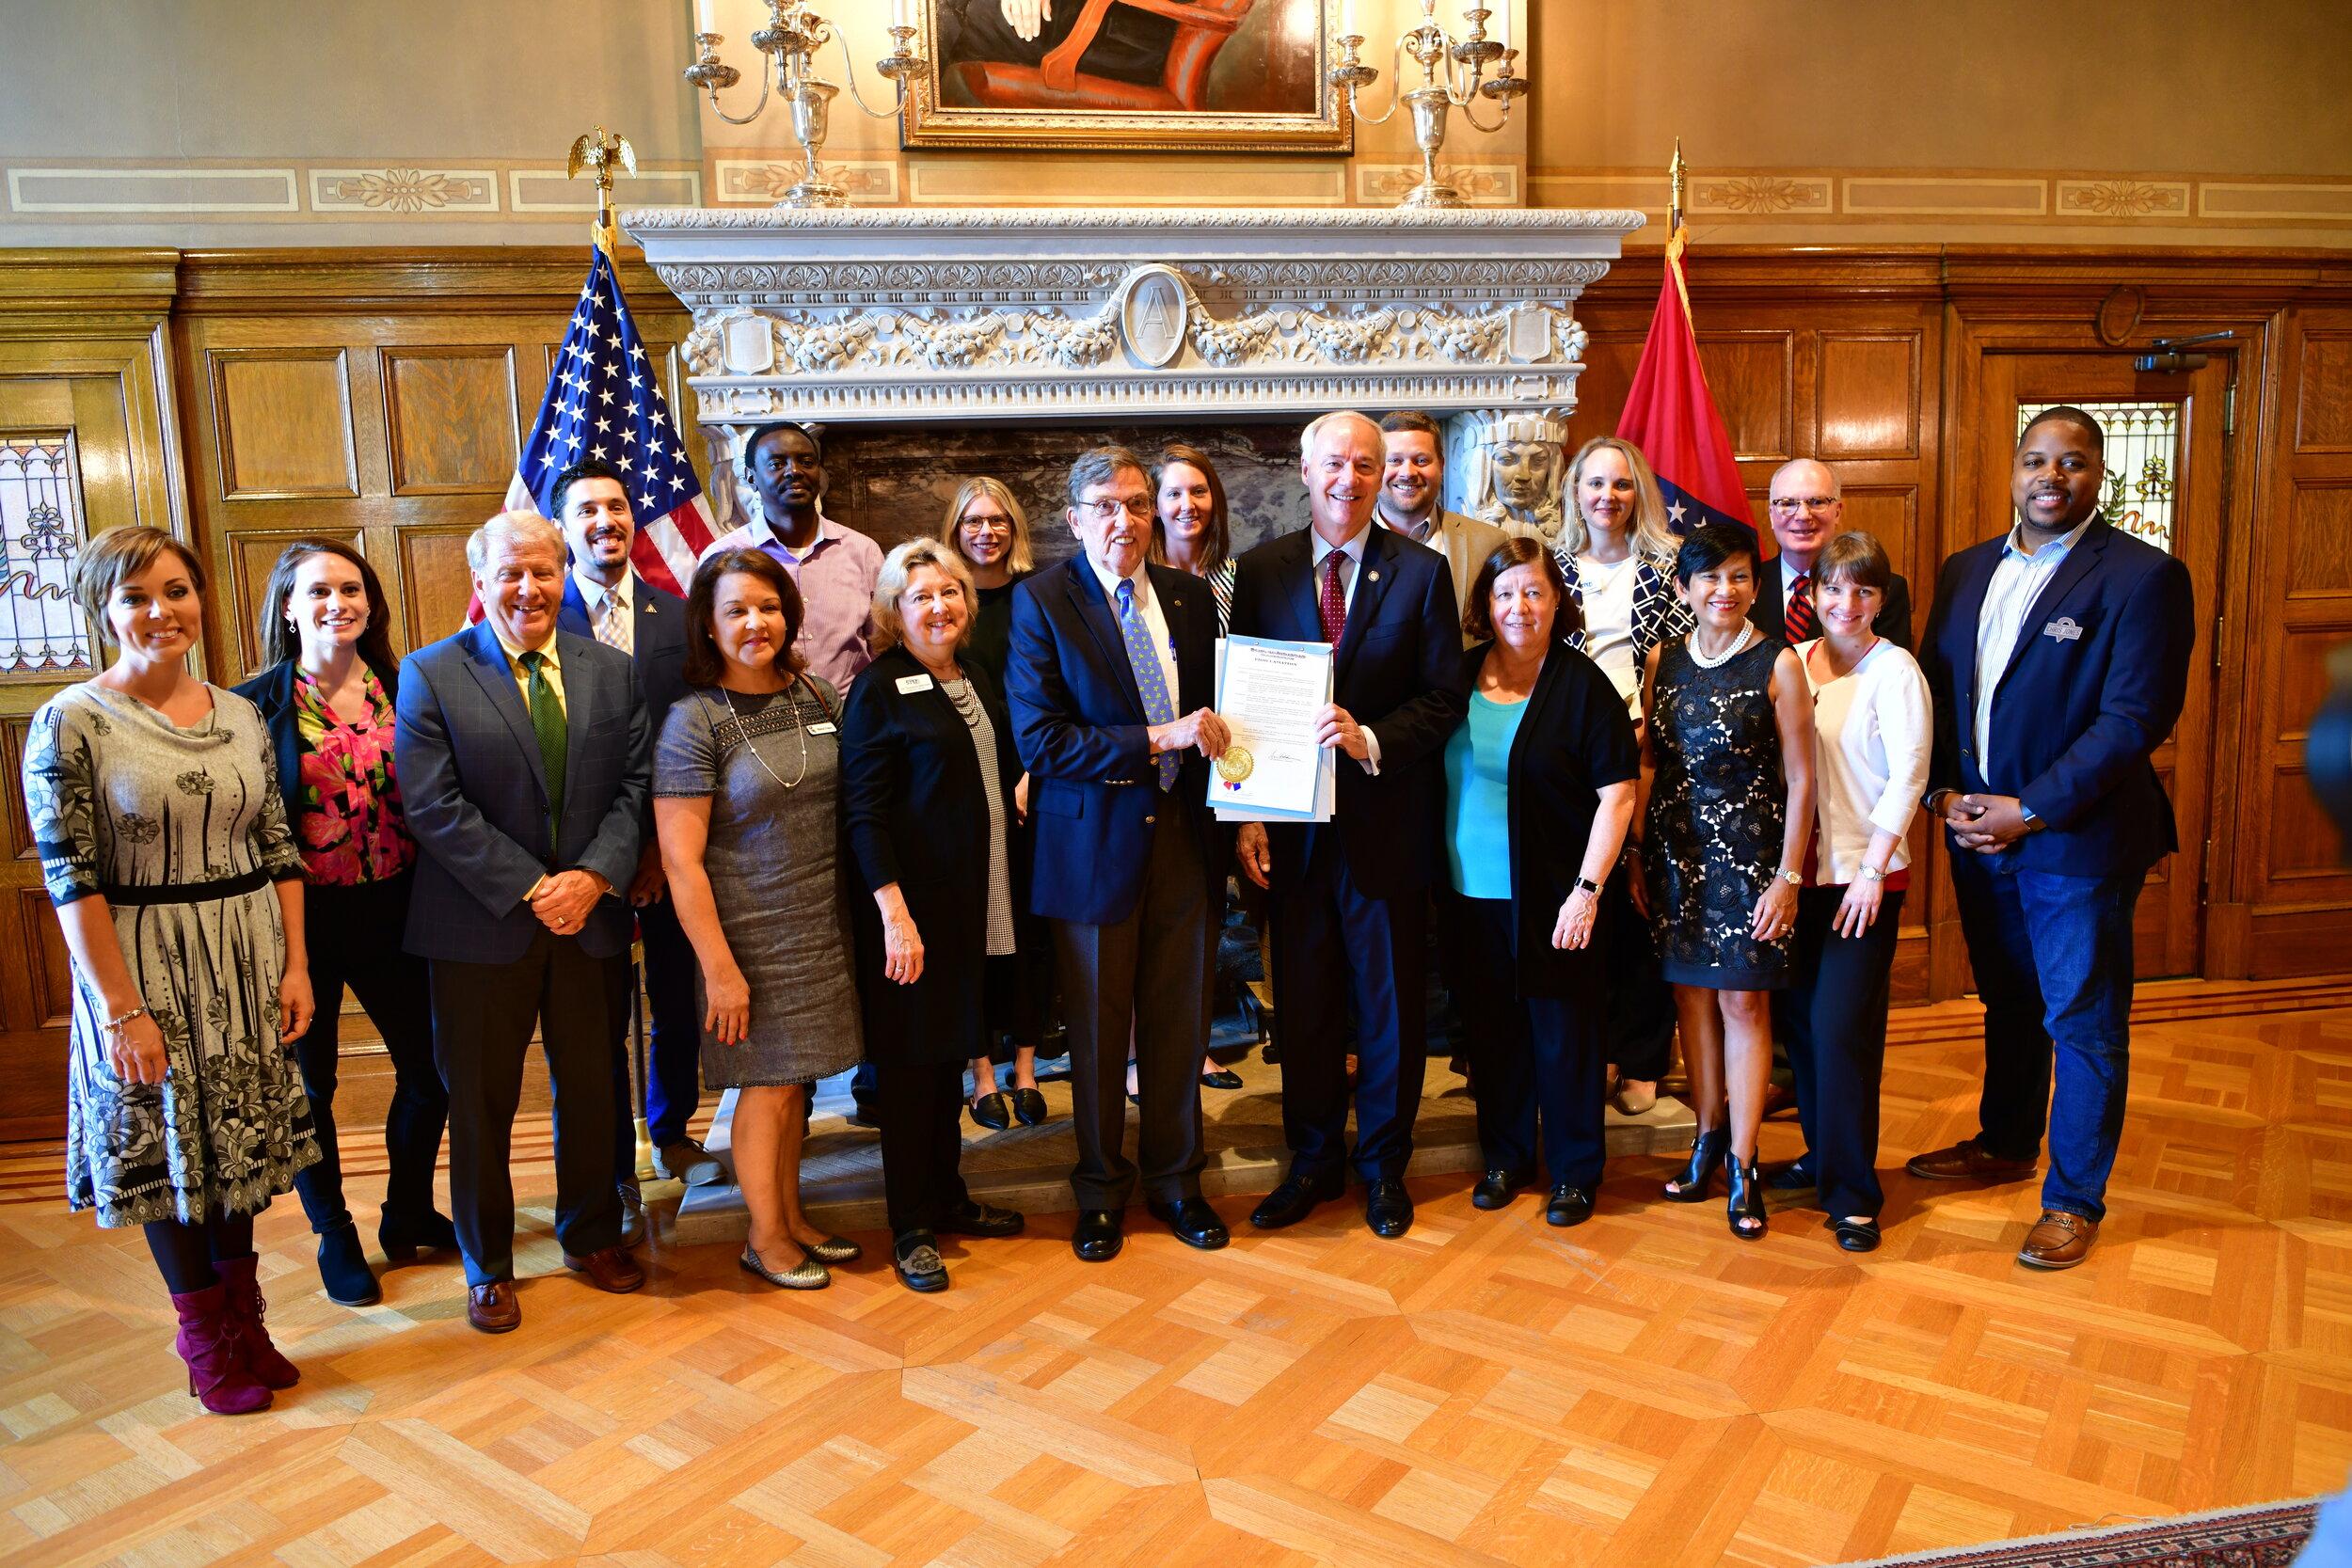 2019 Gov. Hutchinson Signing Proclamation.JPG